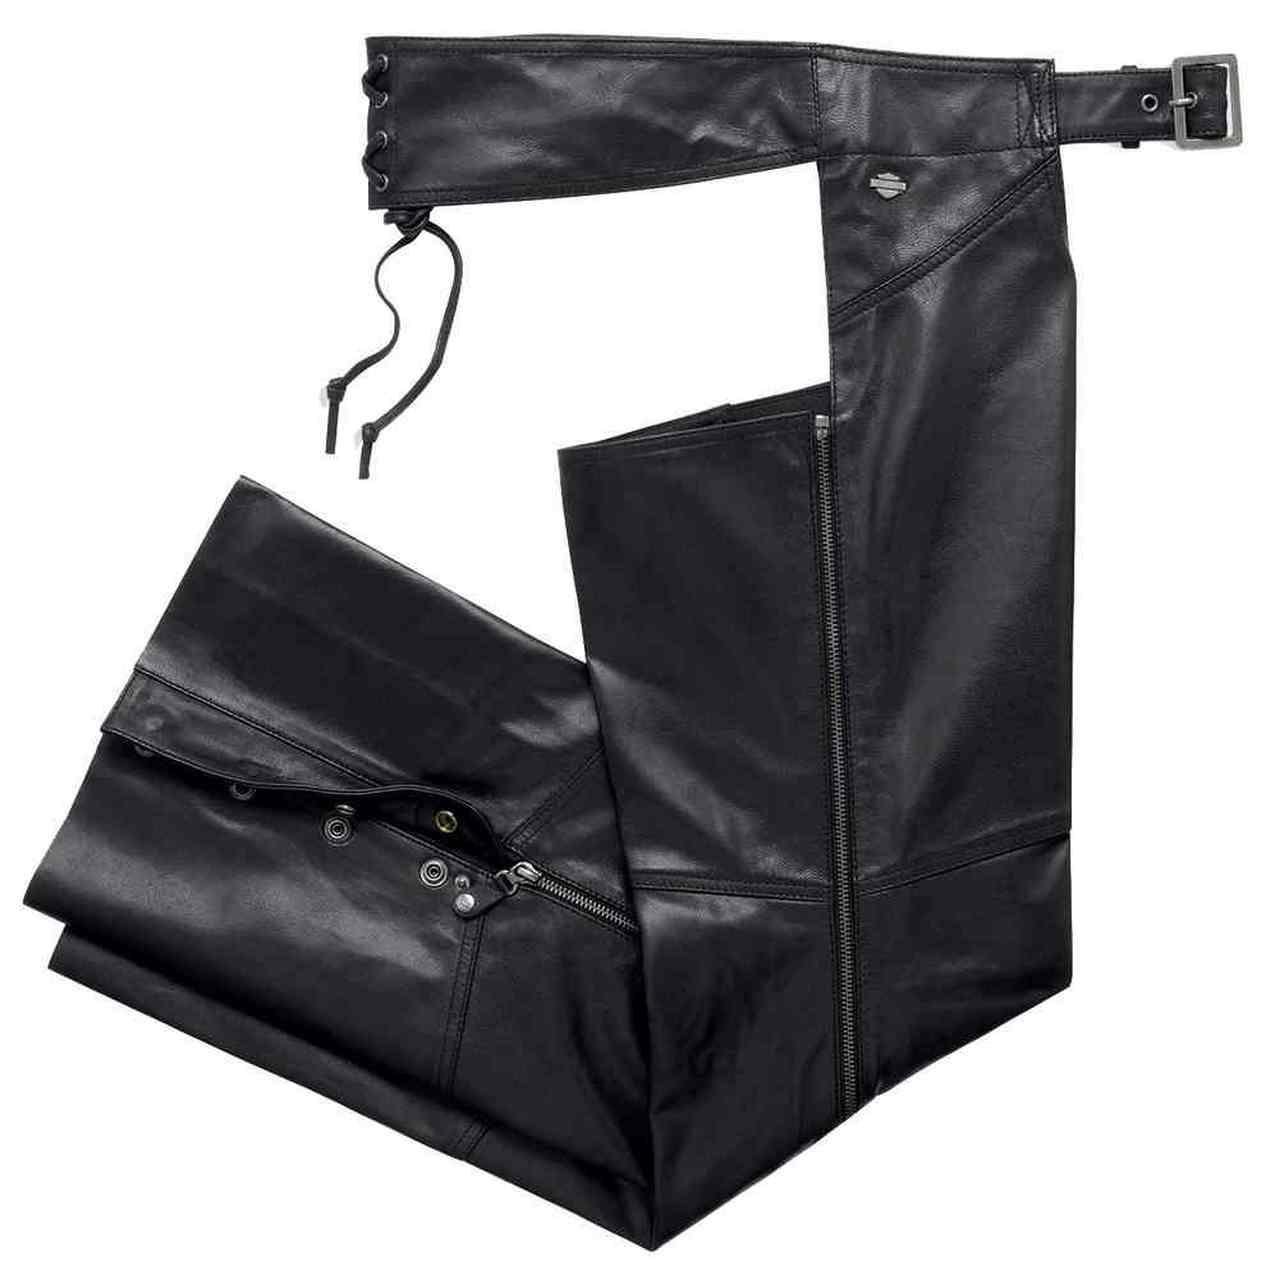 Harley-Davidson® Women's Essentials Leather Riding Chaps, Black.